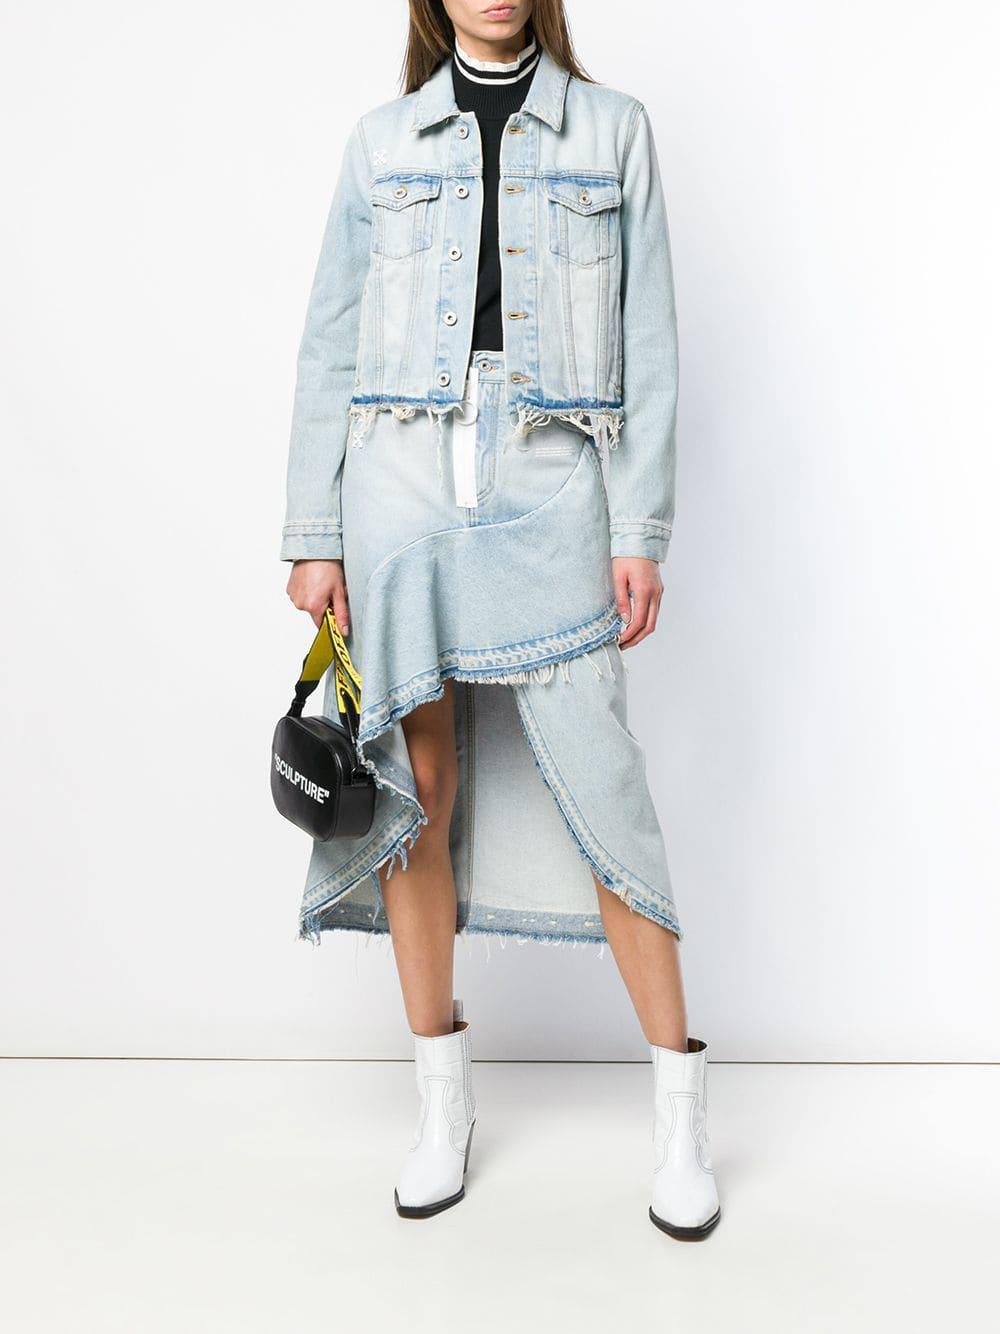 4fc501f7a6 Lyst - Off-White c/o Virgil Abloh Asymmetric Denim Skirt in Blue - Save 71%